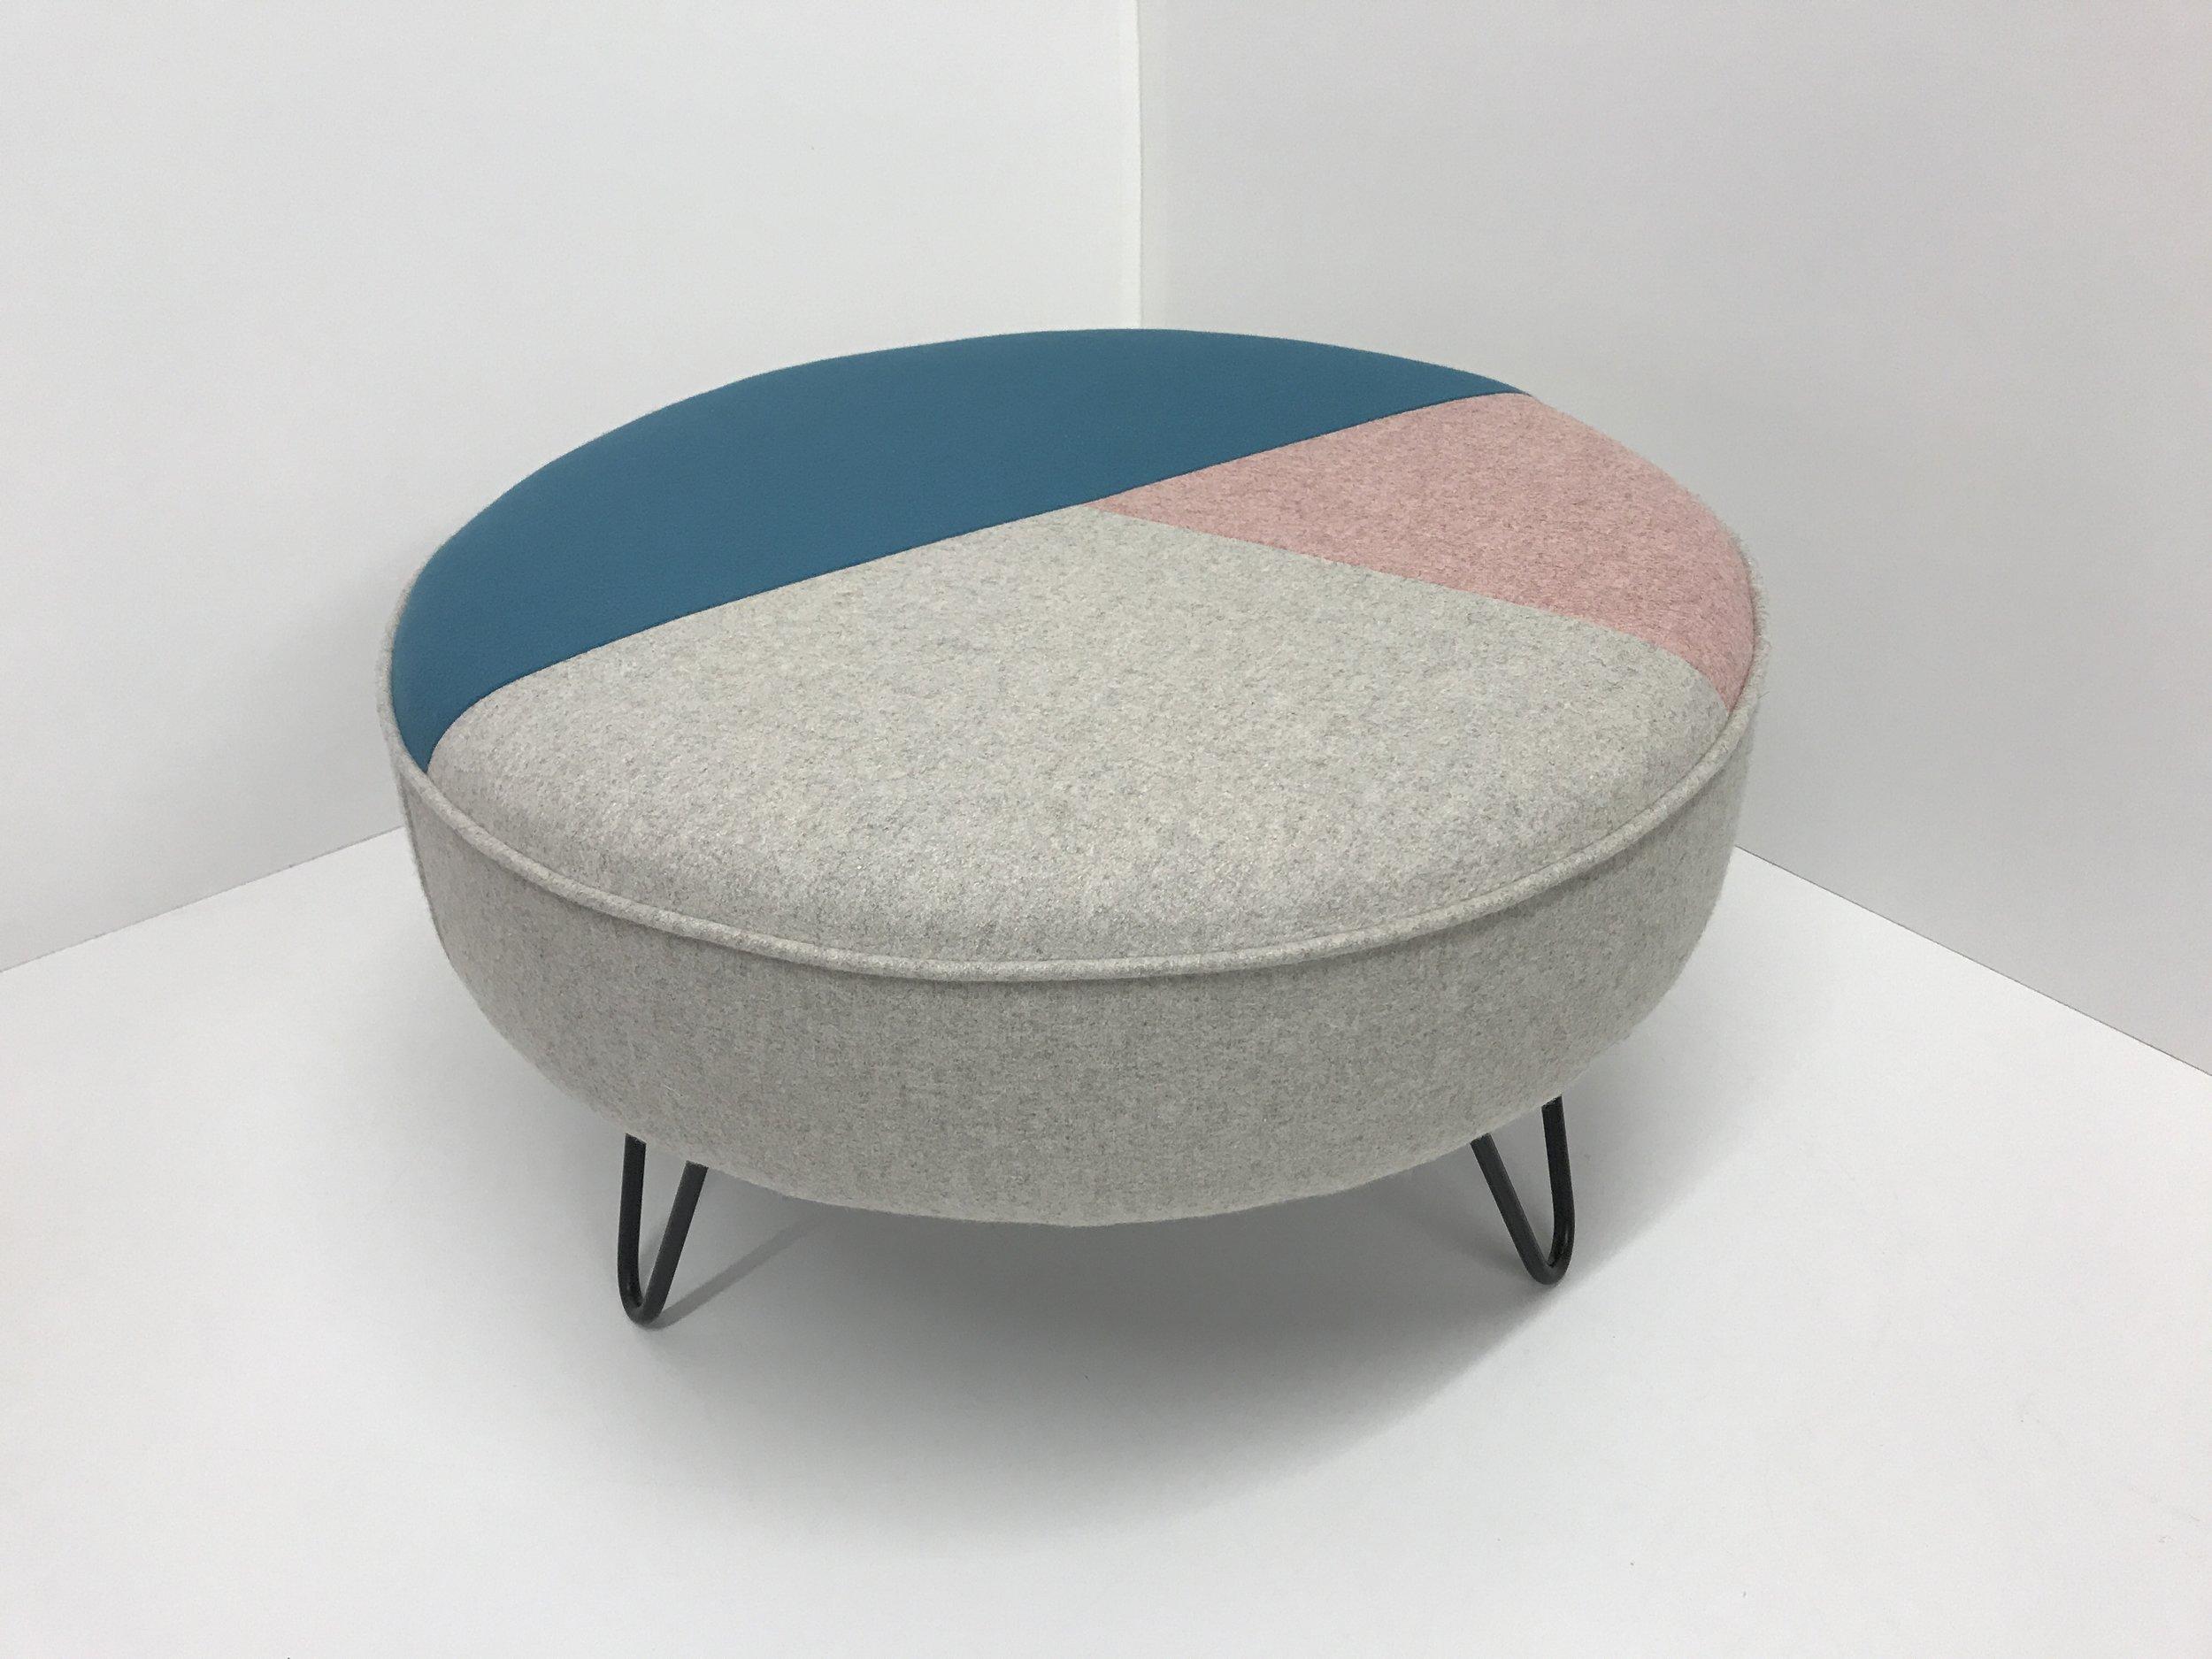 Geometric Hairpin Leg Footstool